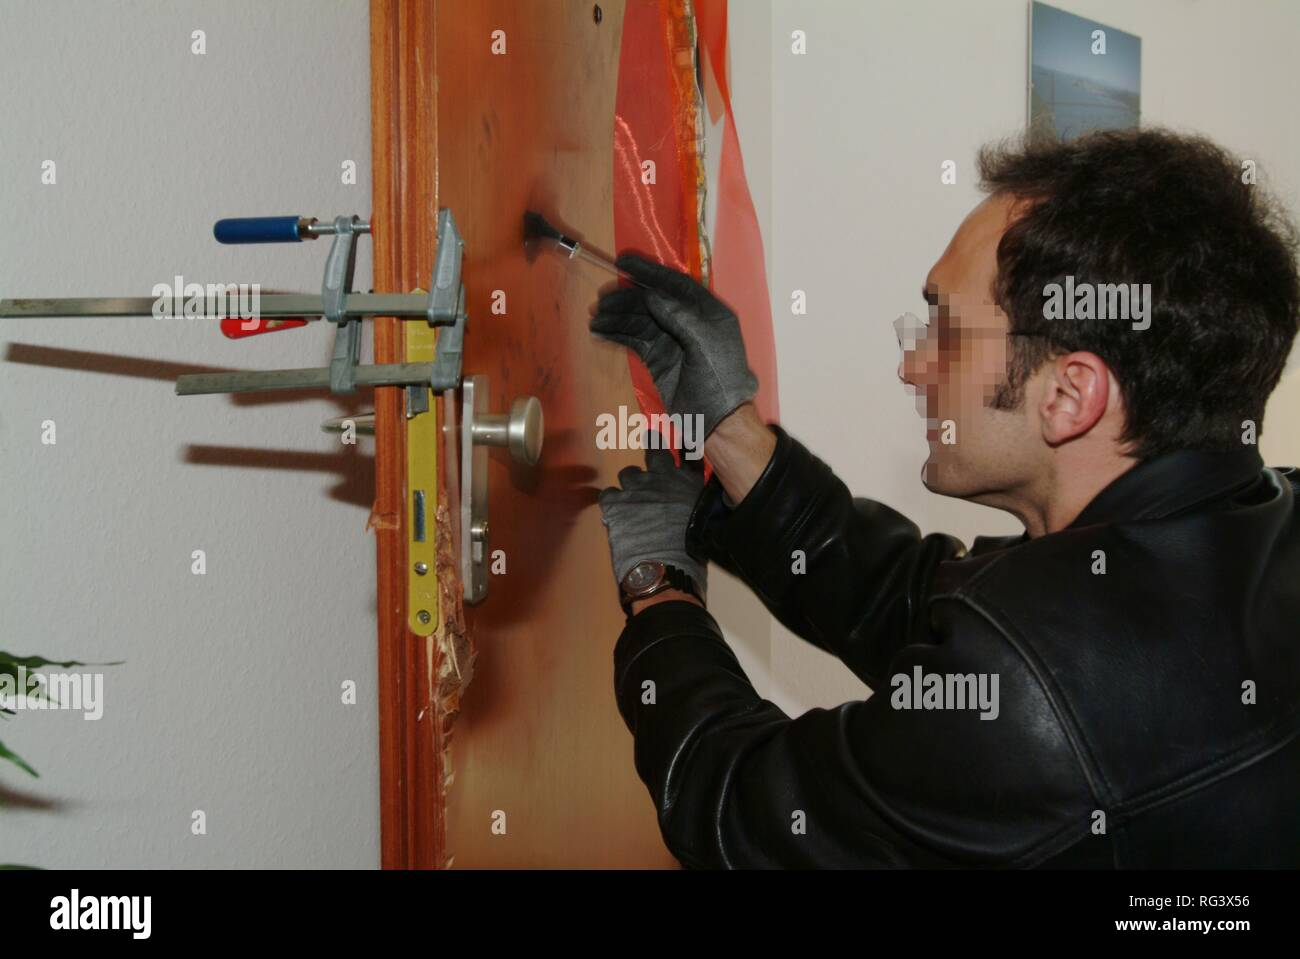 DEU, Germany, NRW: forensic investigator puts coal powder on a broken door, to make fingerprints visible. - Stock Image